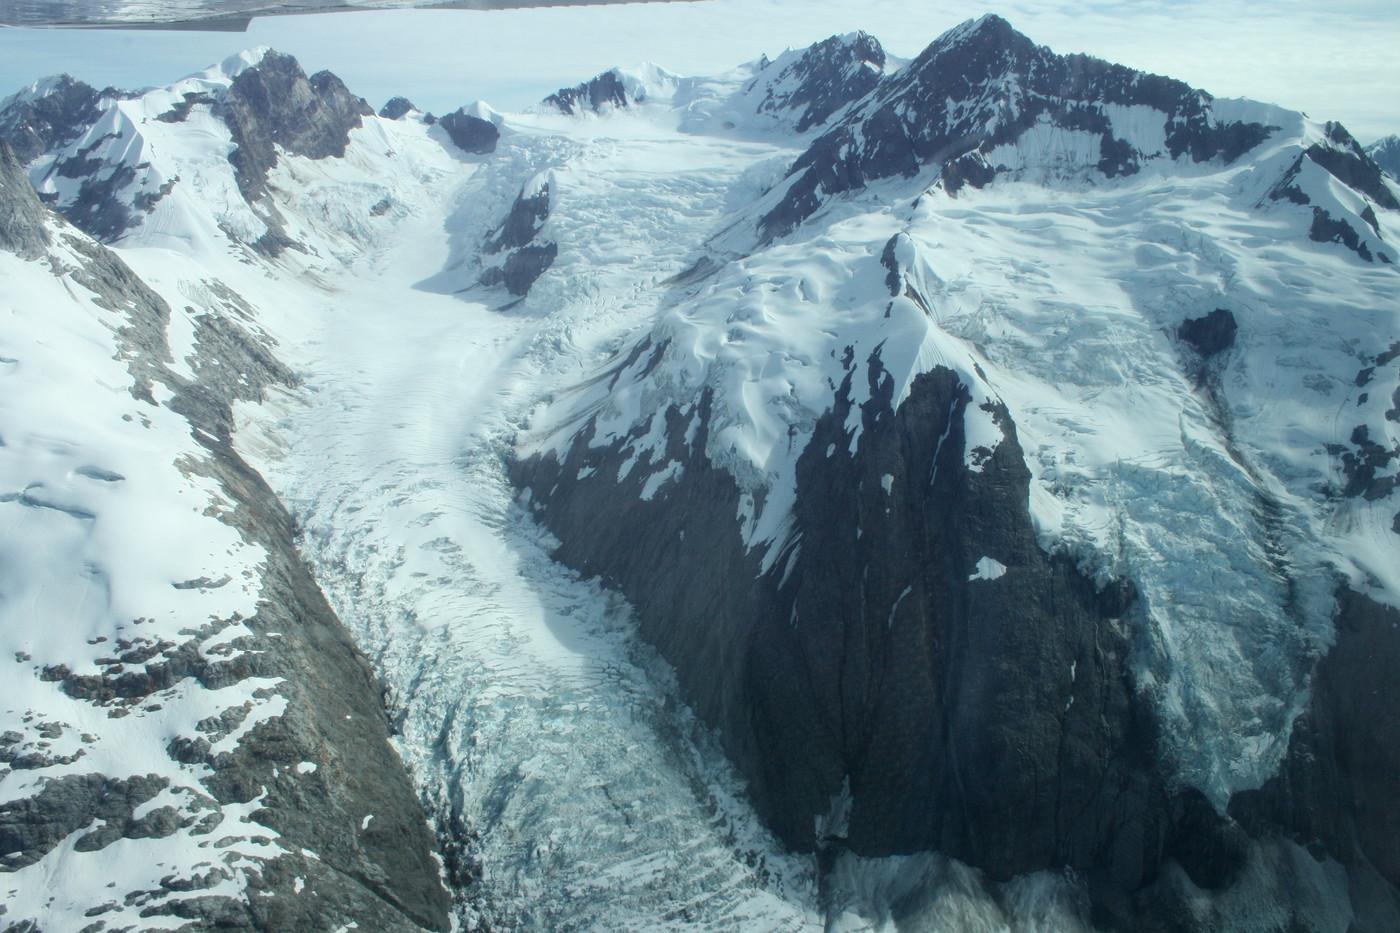 Fairweather Mountain Range from air